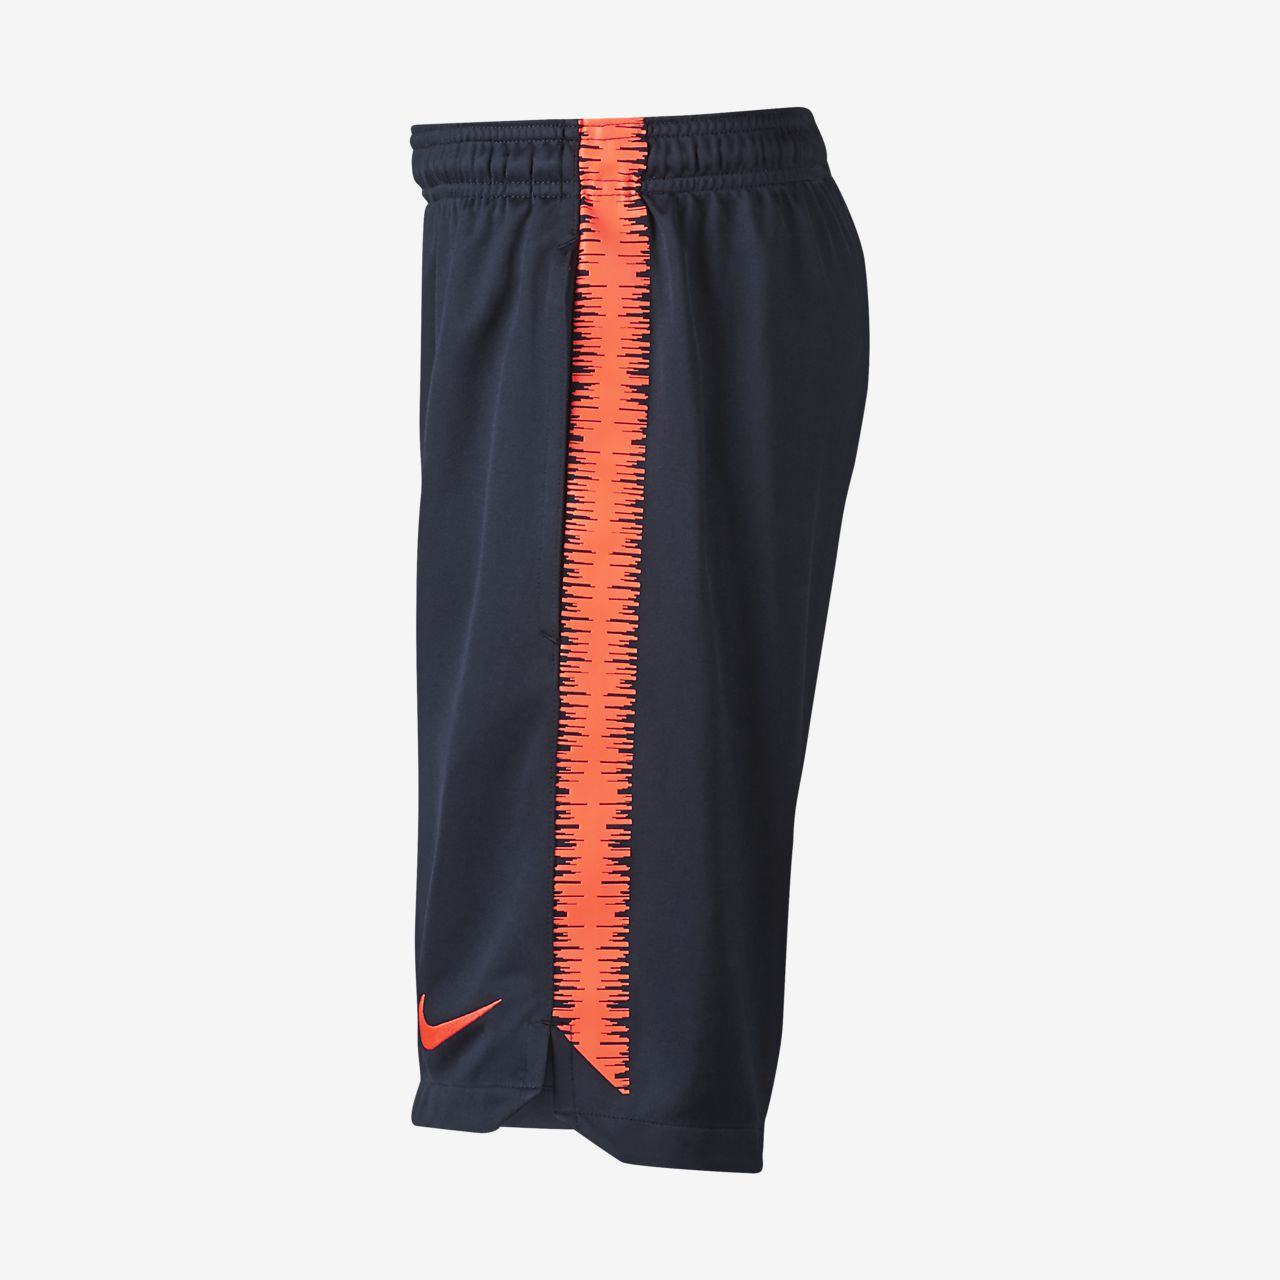 ... FC Barcelona Dri-FIT Squad Men's Football Shorts